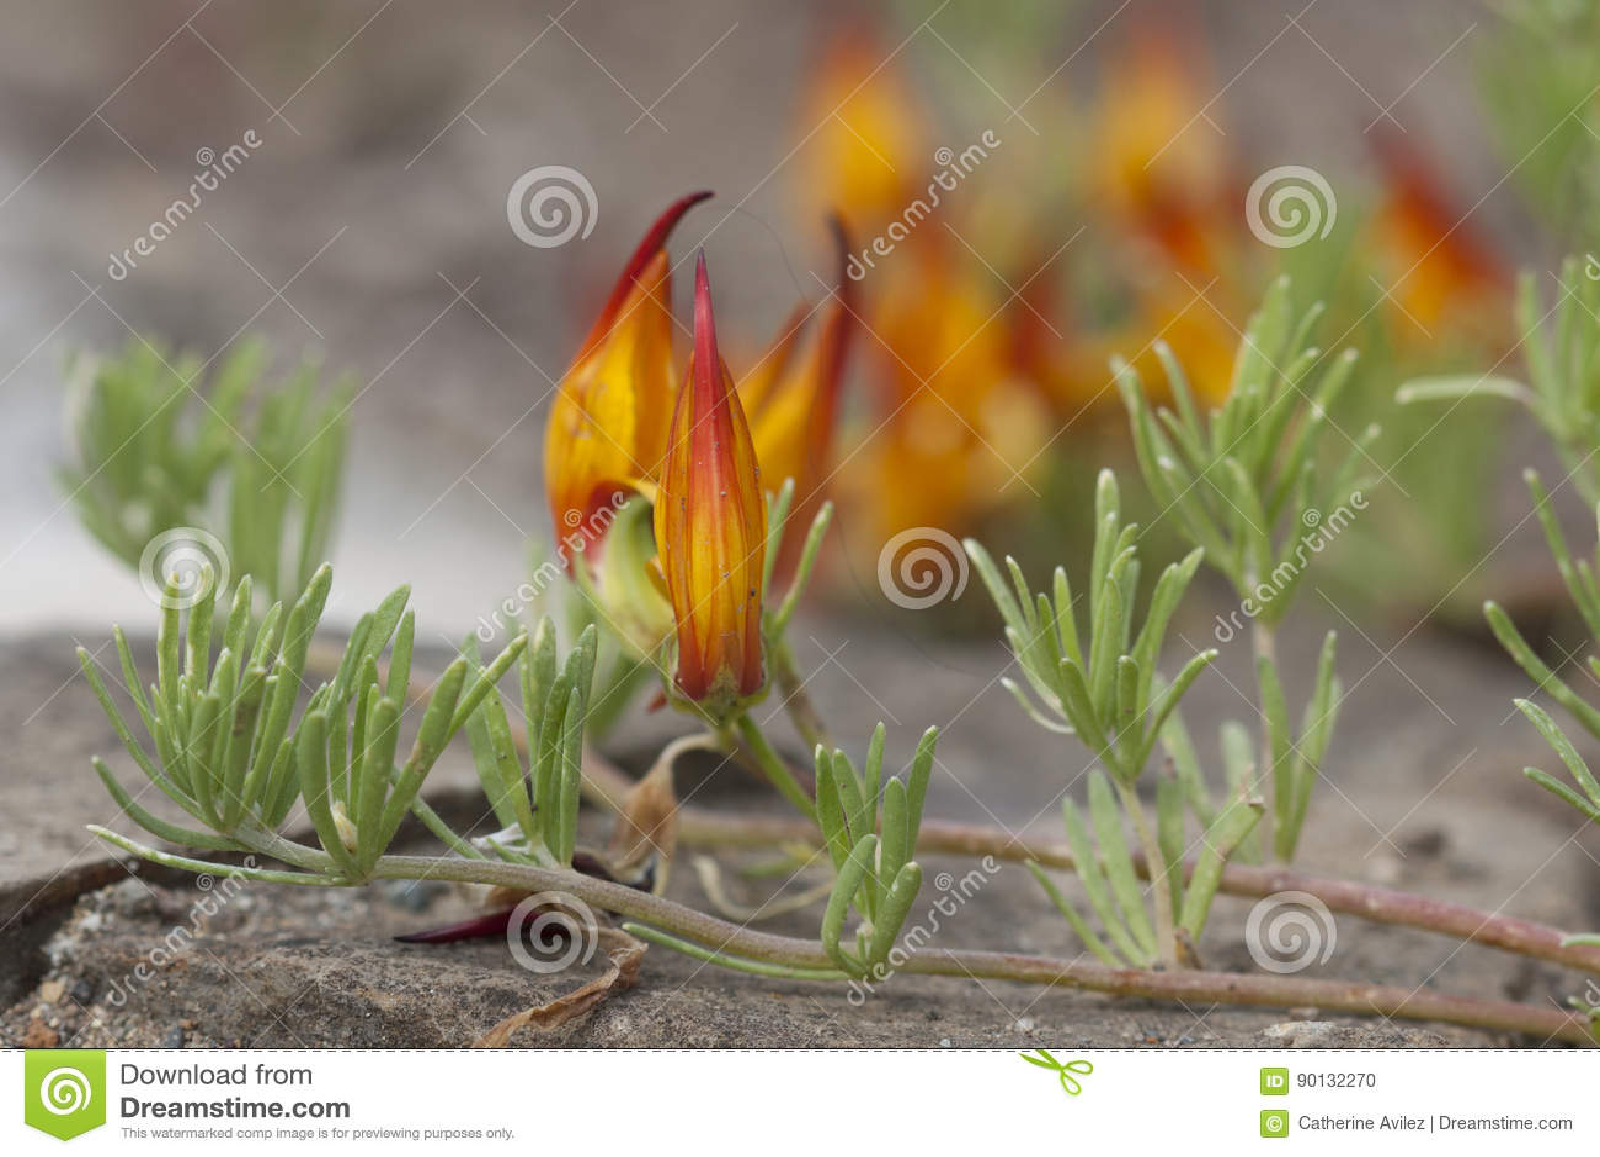 Orange lotus plant bloom stock photo image of flower 90132270 orange lotus plant bloom izmirmasajfo